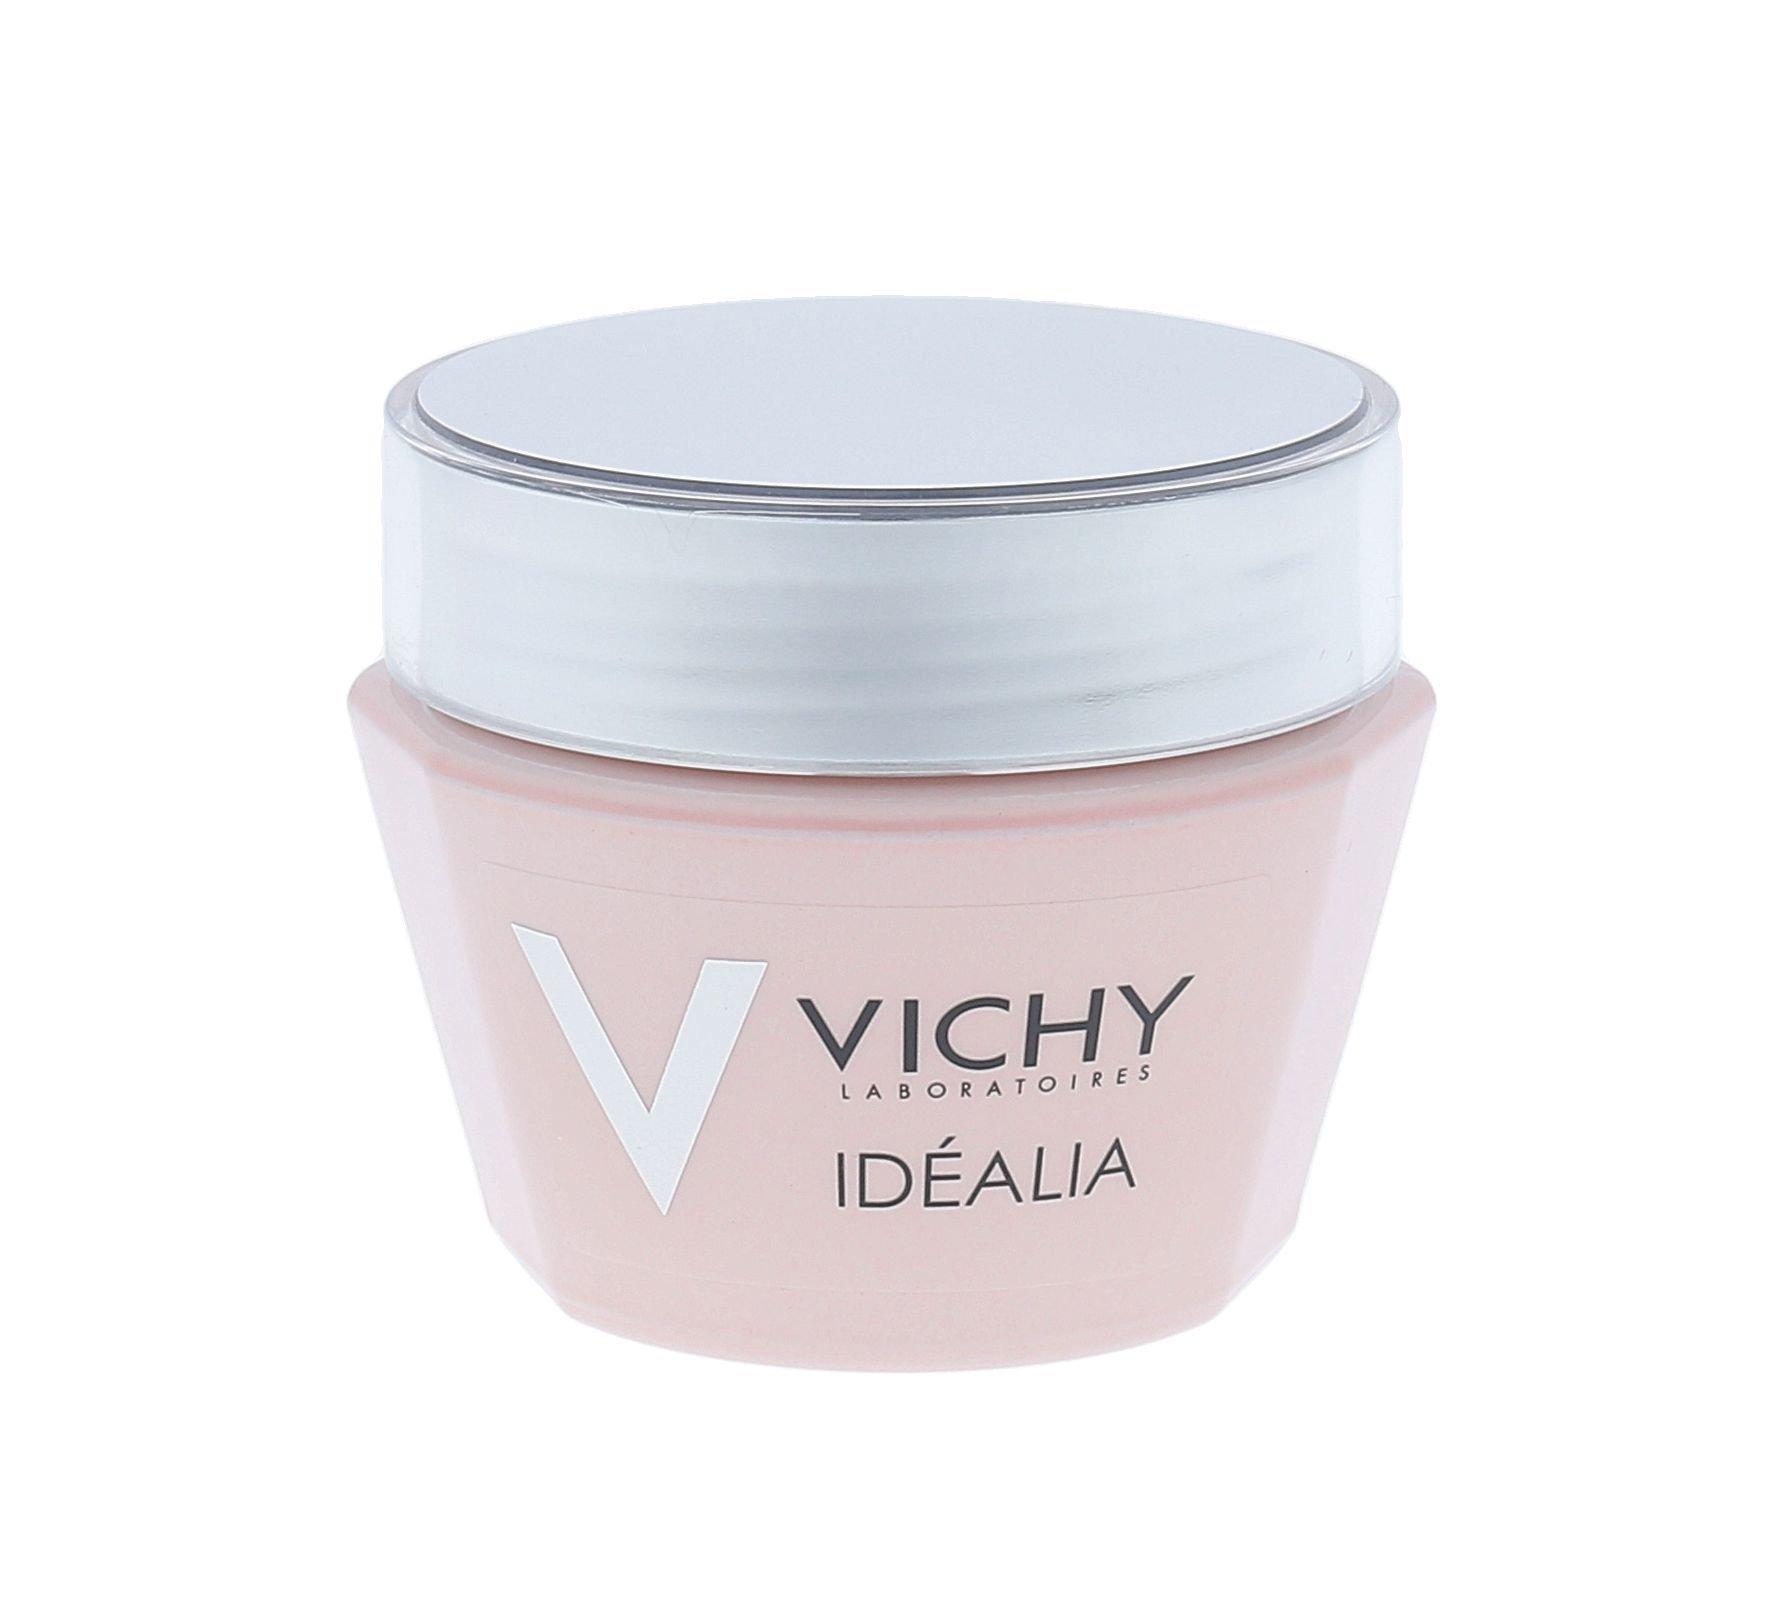 Vichy Idéalia Cosmetic 50ml